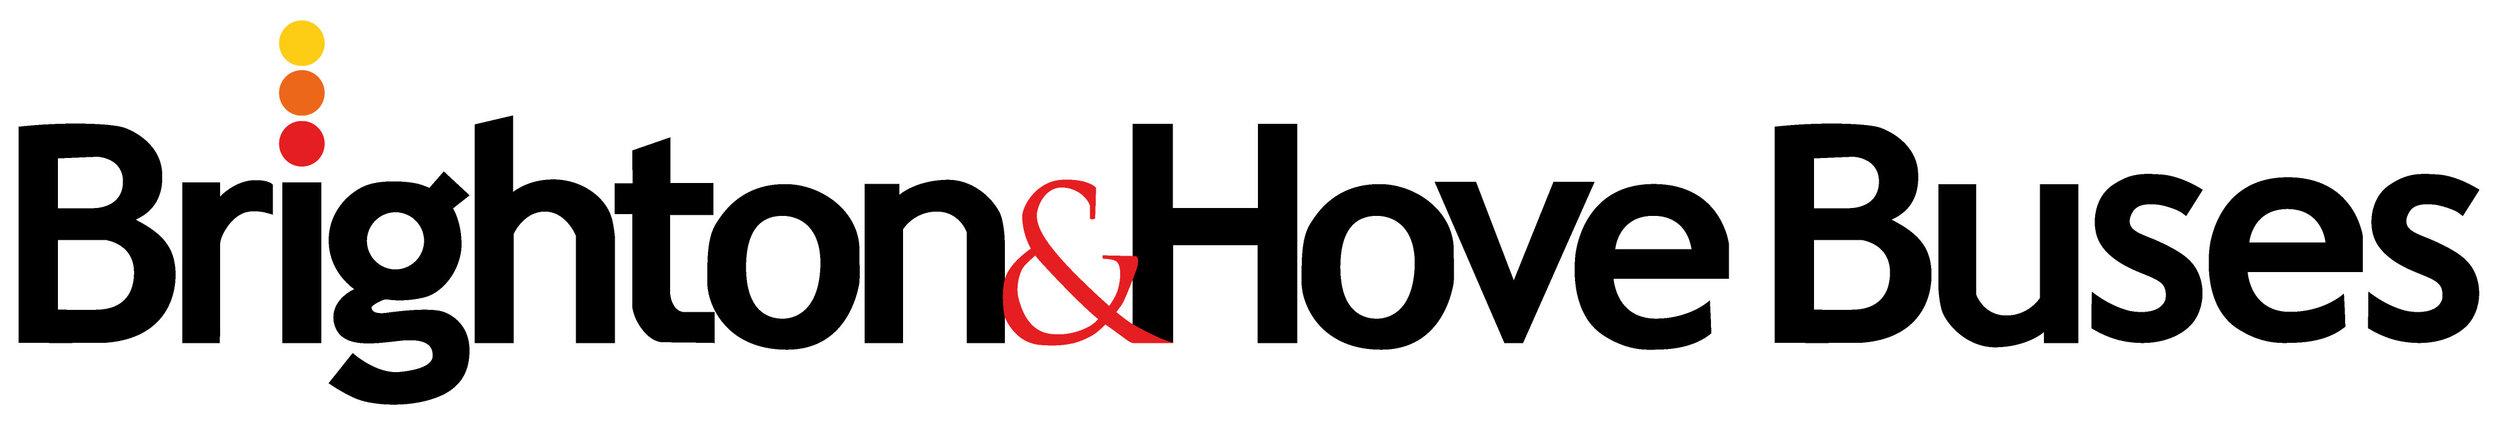 B&H-Buses-Logo-Colour-JPEG.JPG